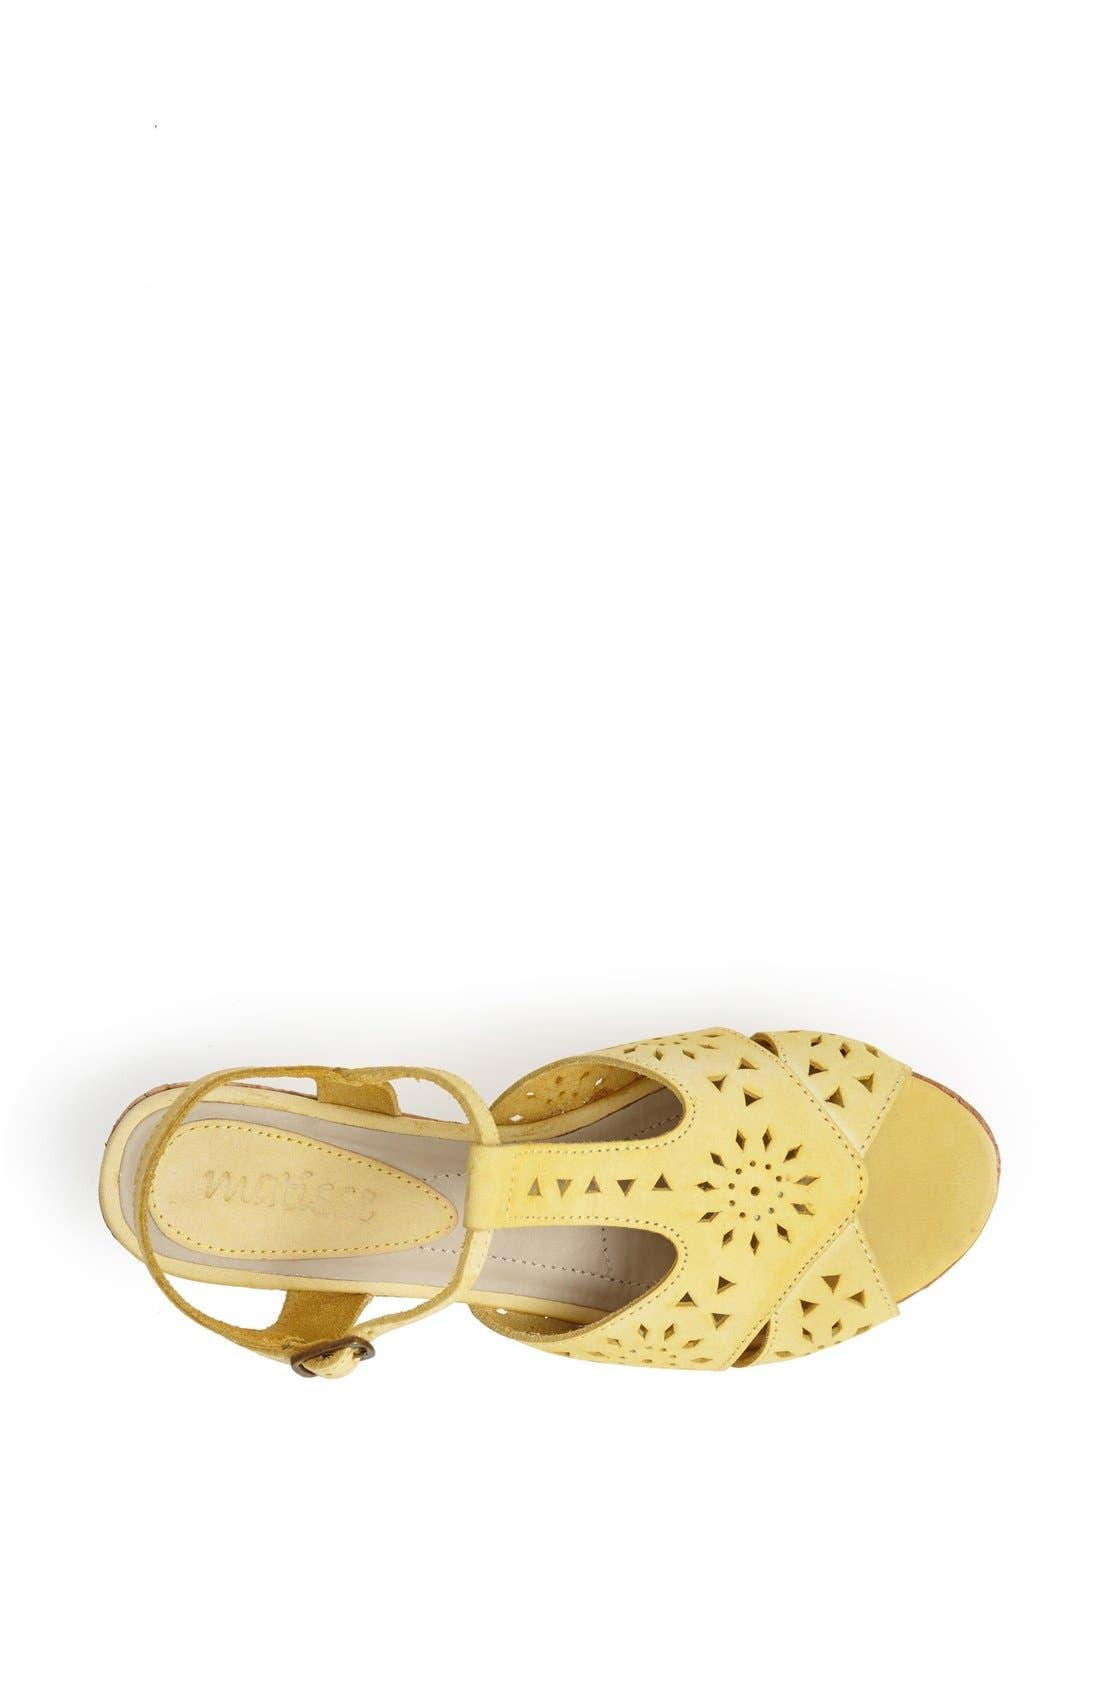 Alternate Image 3  - Matisse 'Sweet' Leather T-Strap Wedge Sandal